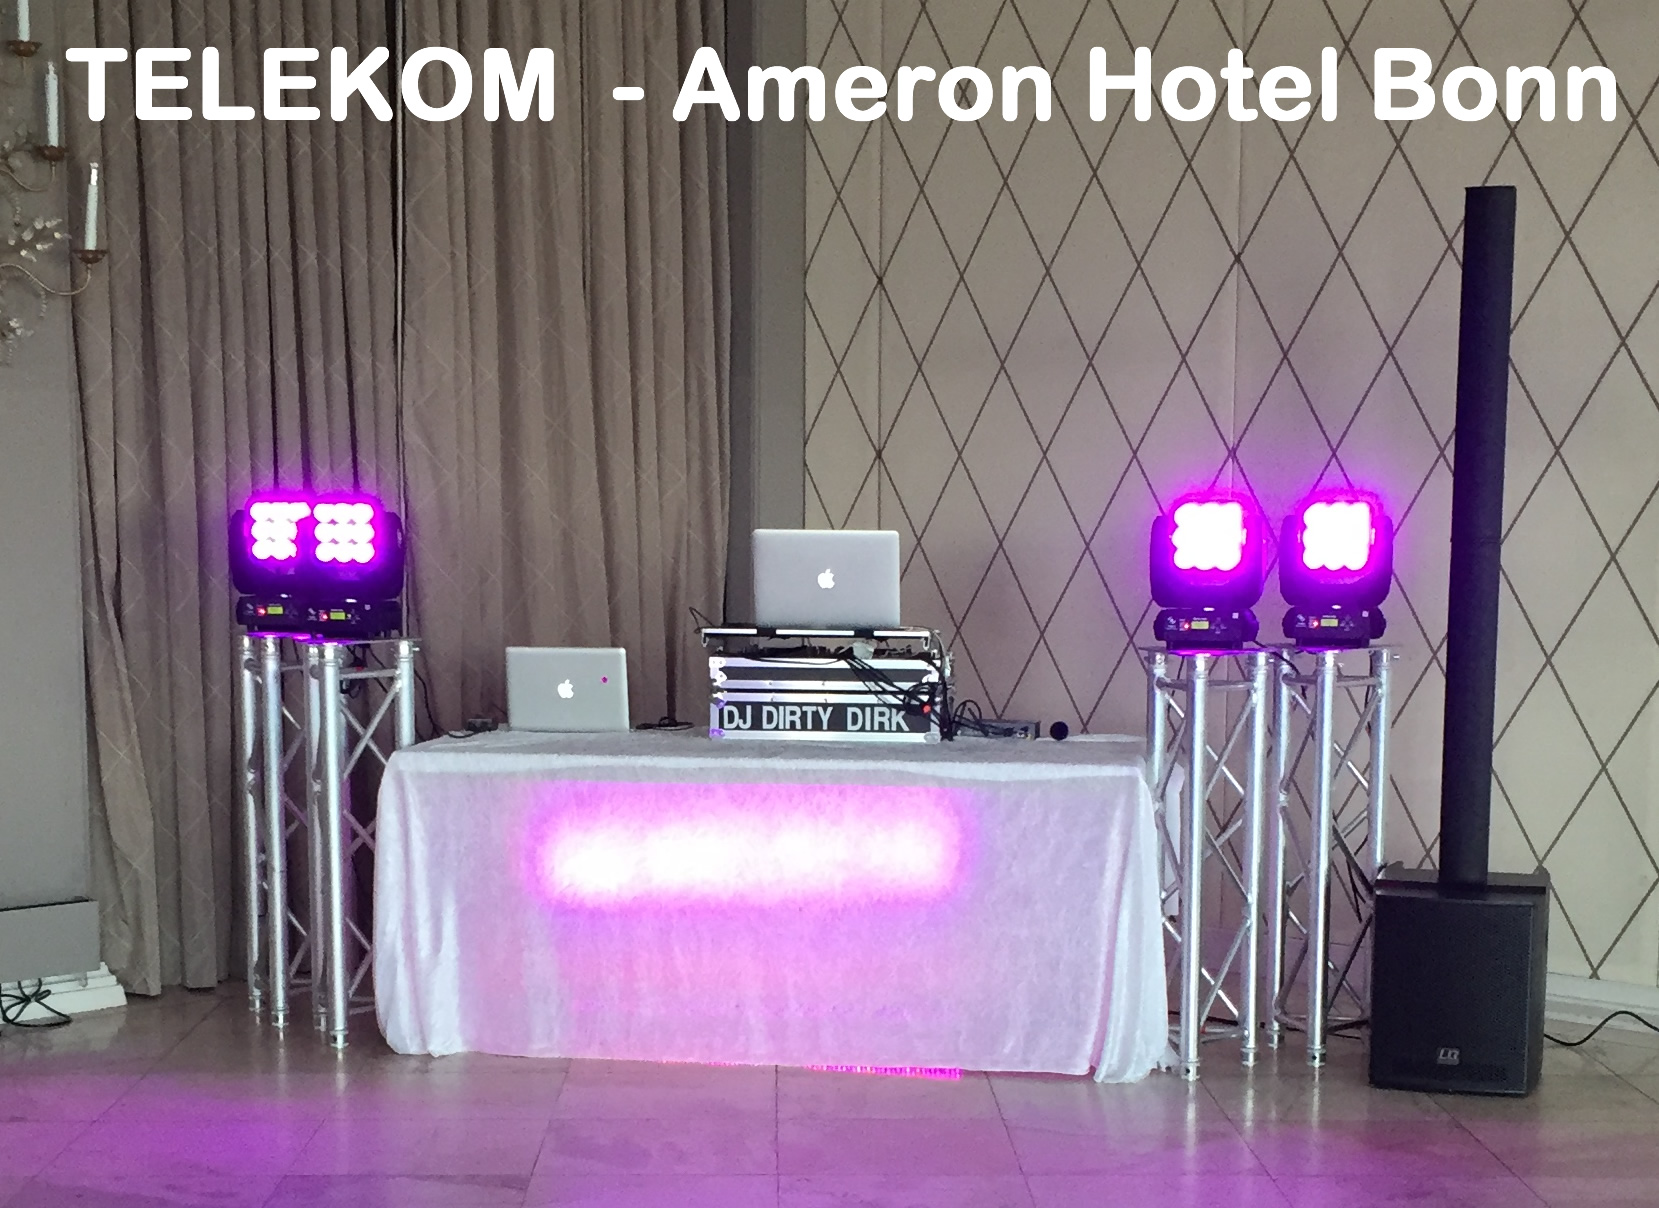 2017 03 13 - Telekom Ameron